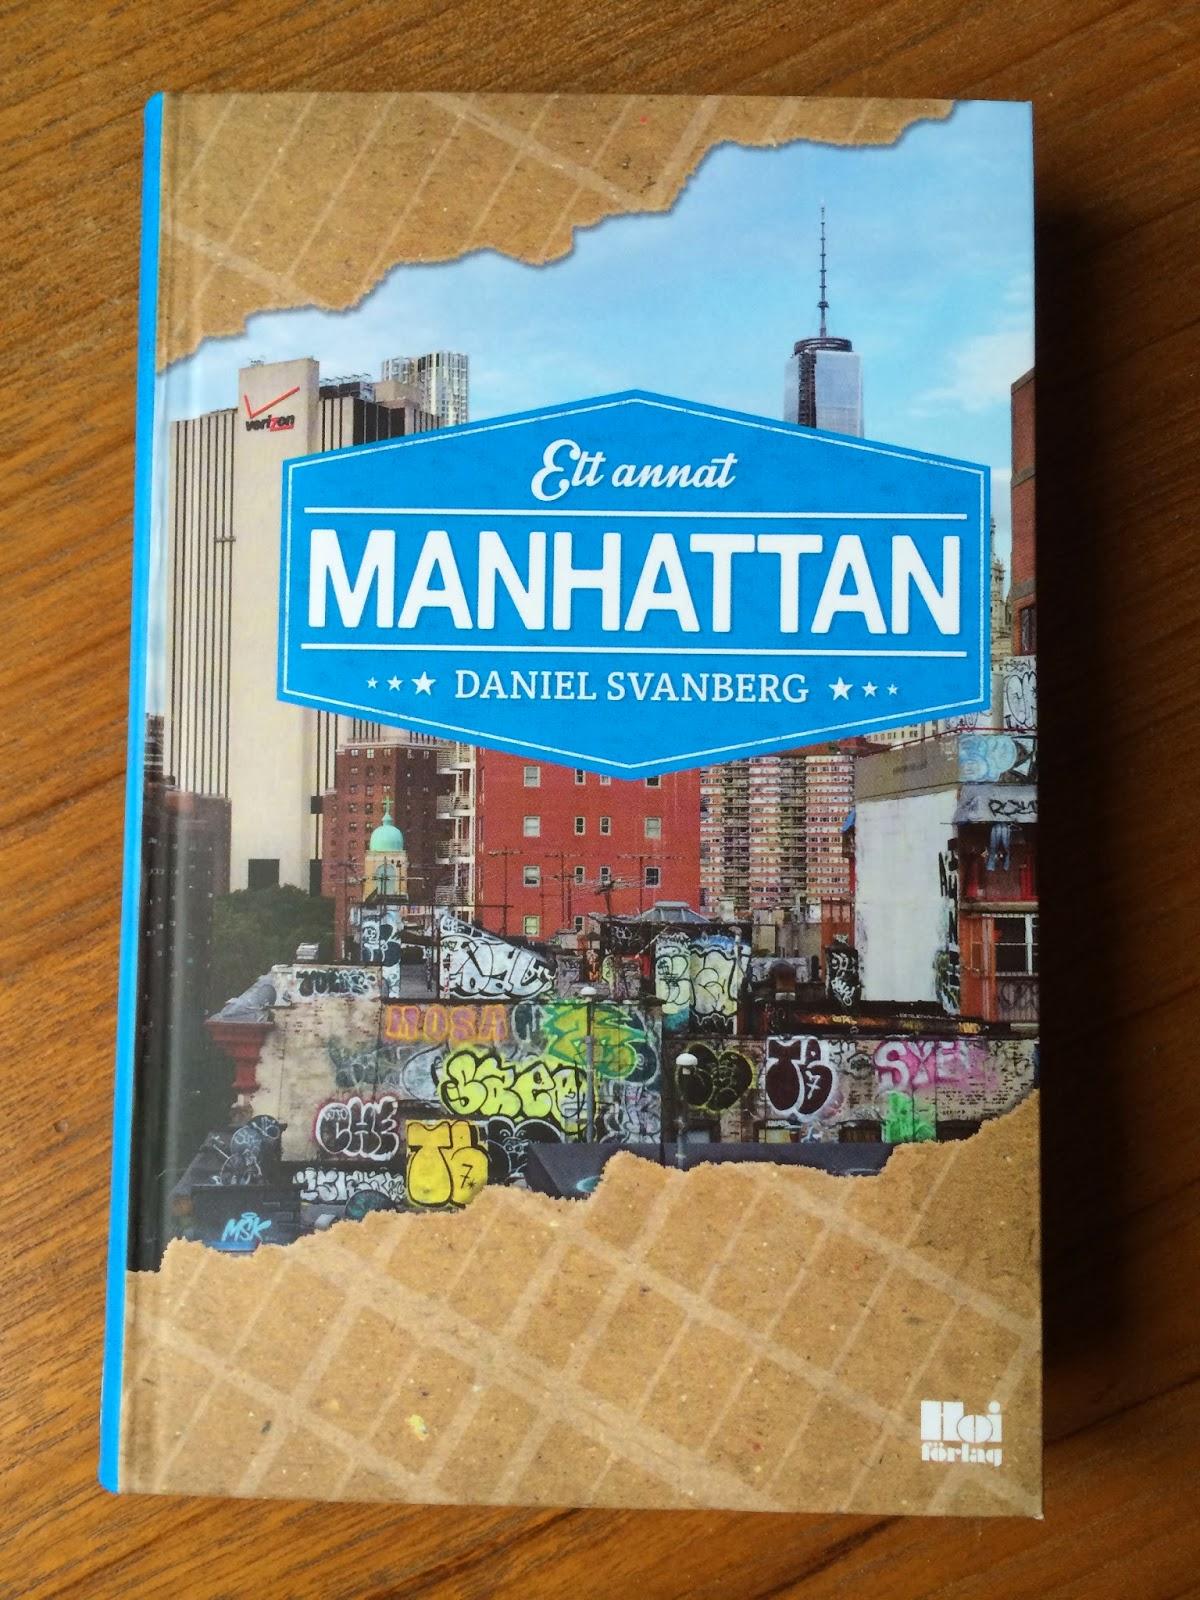 537. Ett annat Manhattan